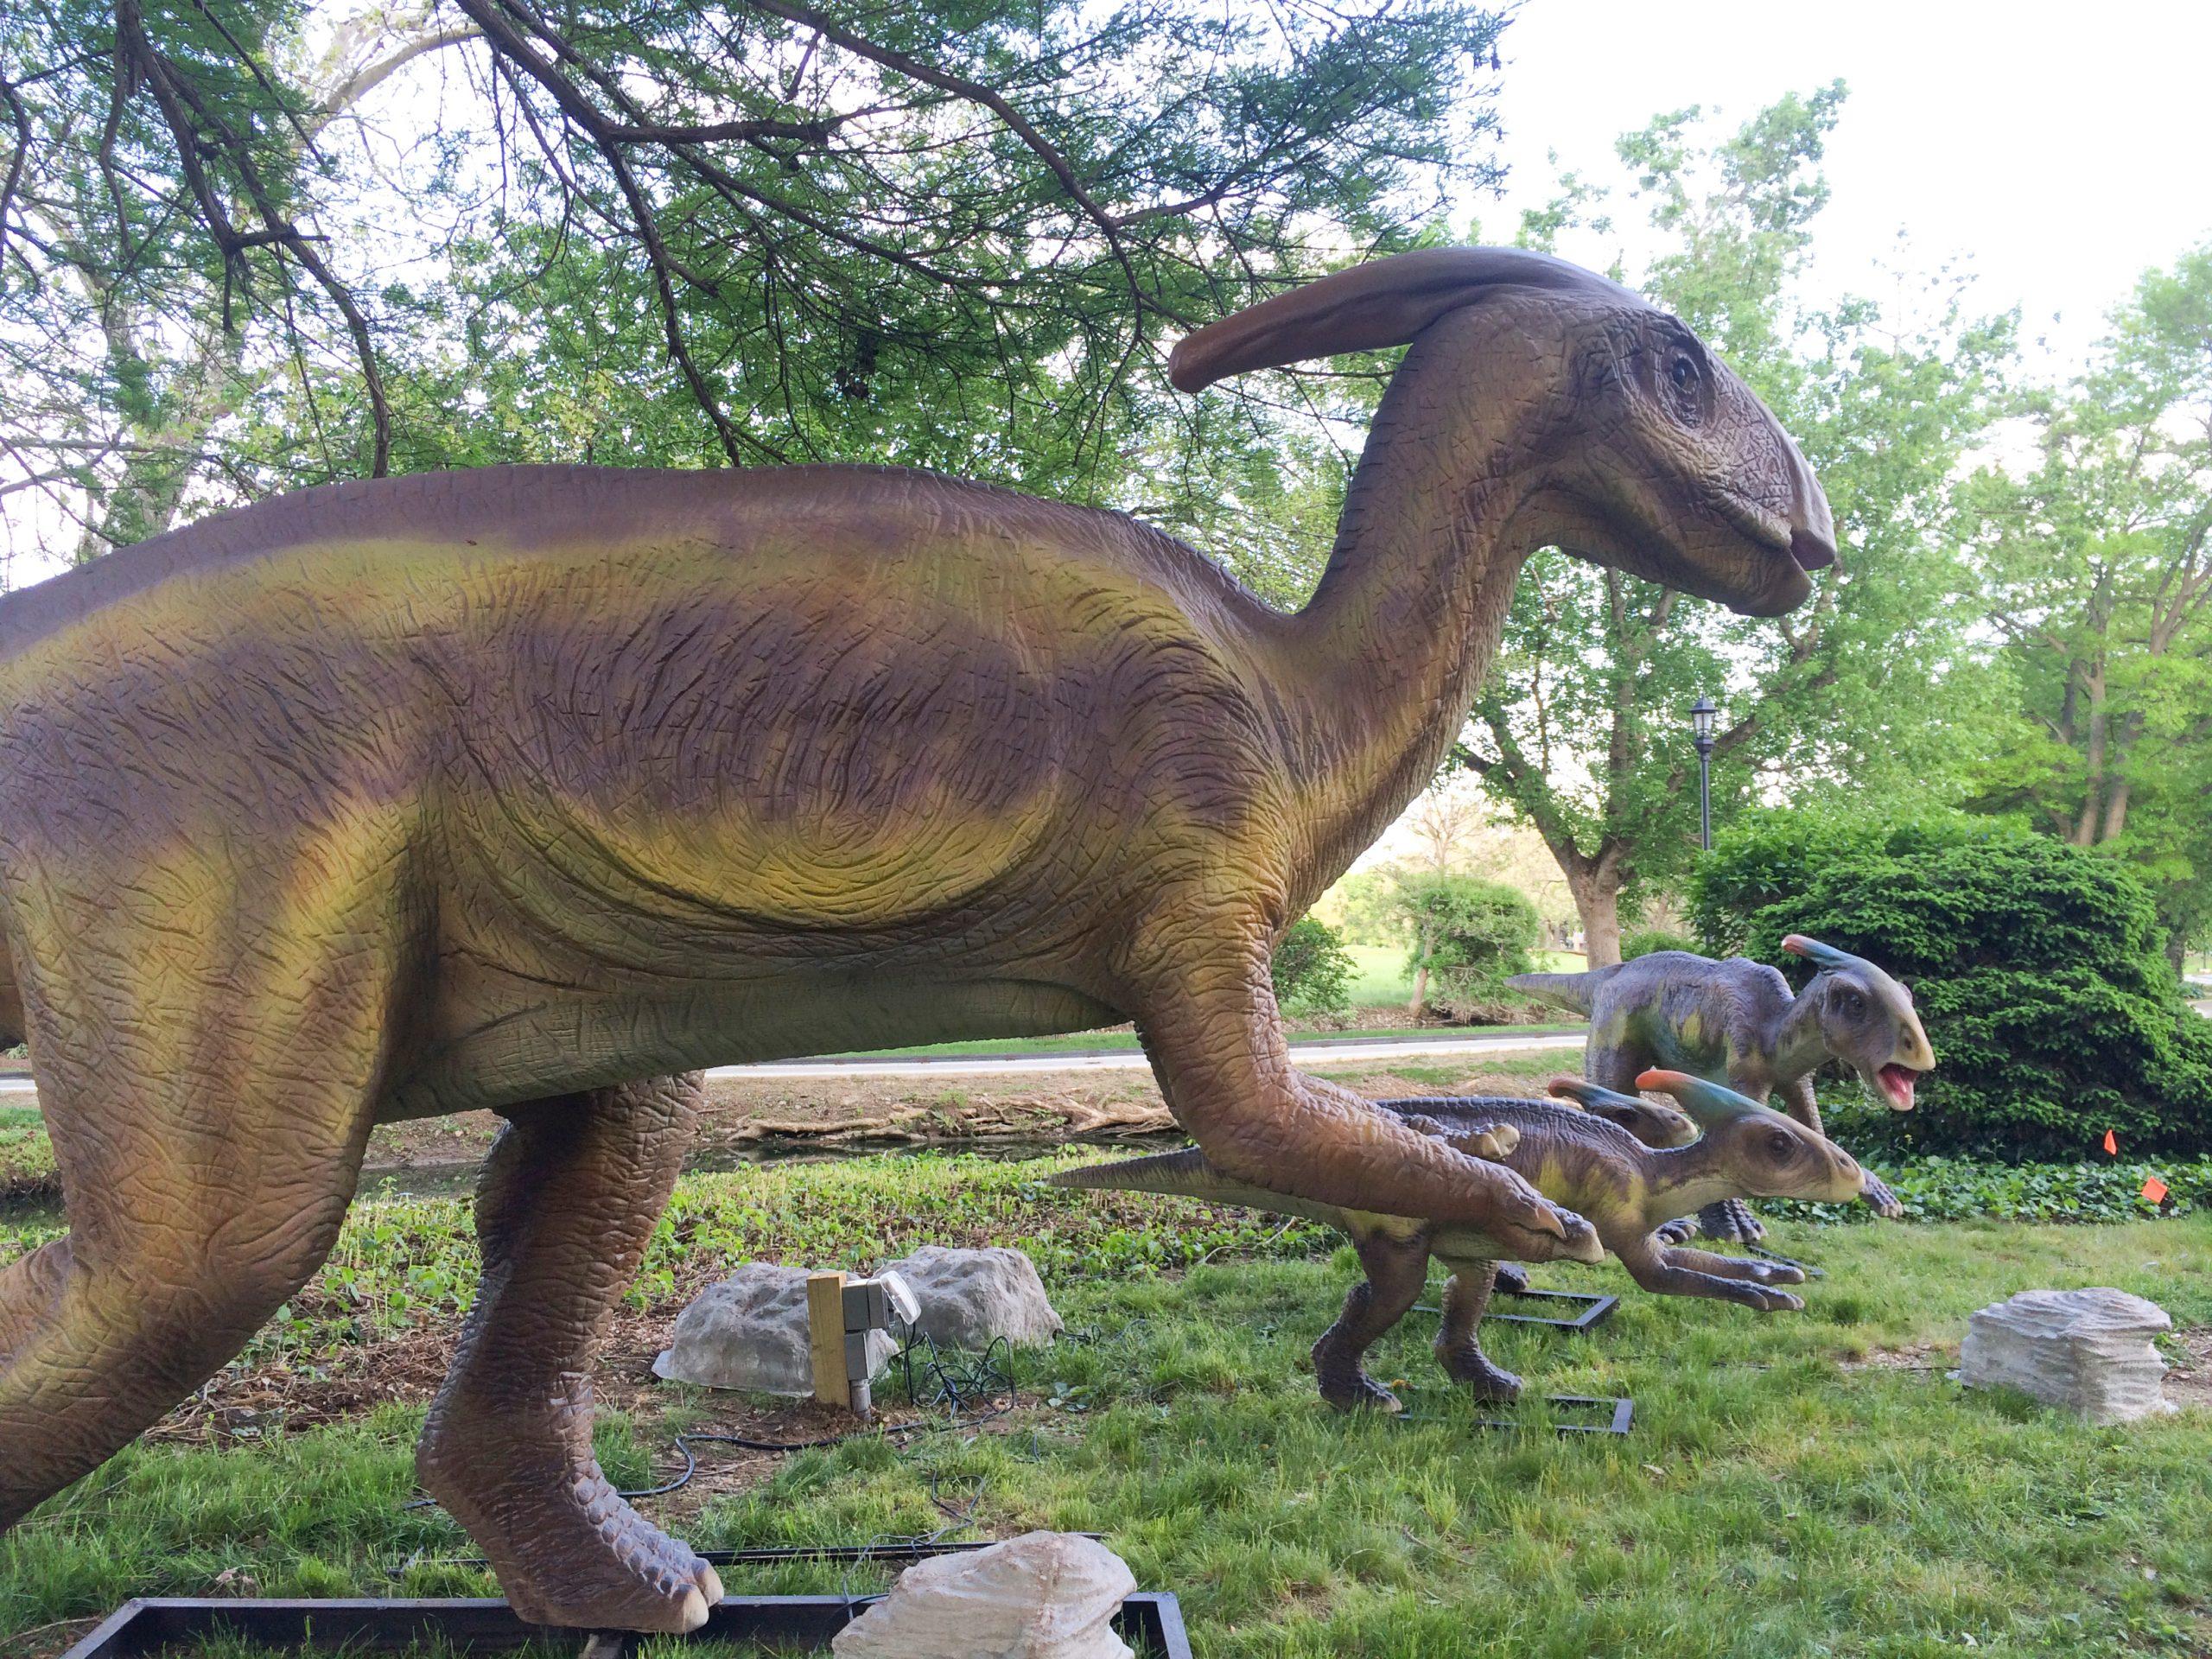 Six-Interesting-Dinosaur-Descendants-That-Live-On-Earth-Today-1